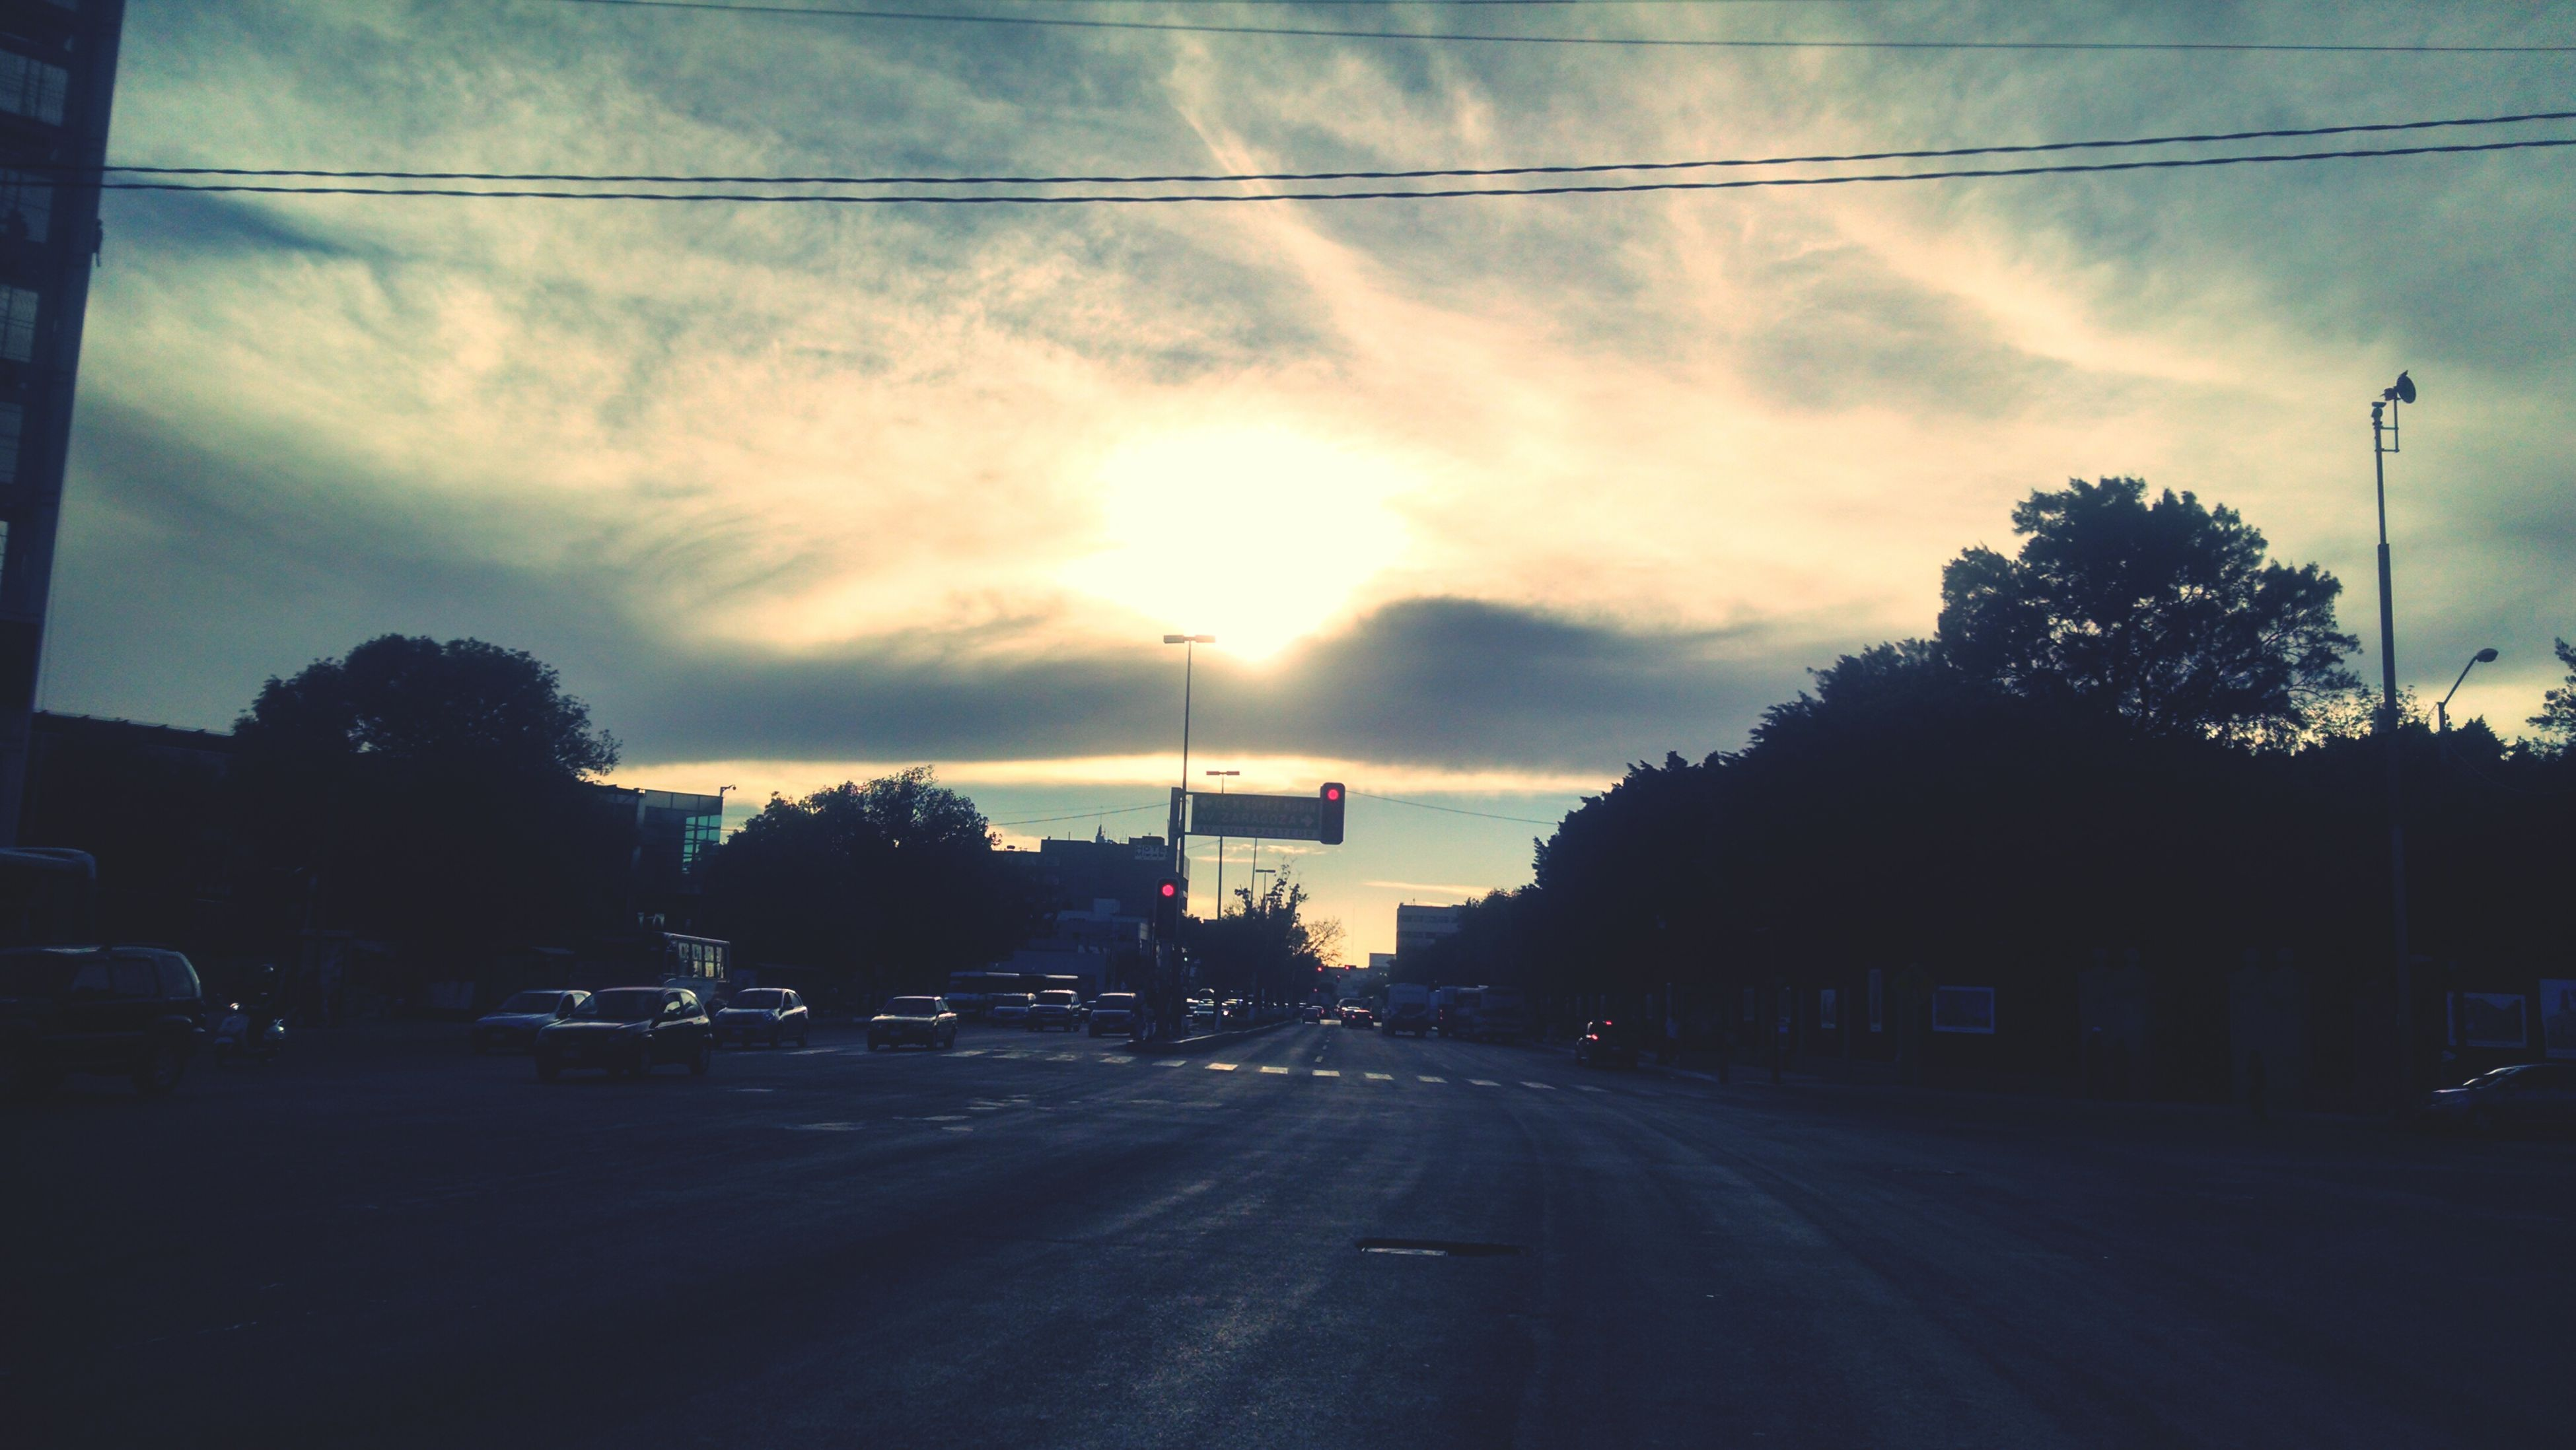 sunset, sky, road, transportation, cloud - sky, silhouette, street, the way forward, tree, street light, car, cloud, cloudy, power line, electricity pylon, land vehicle, sun, diminishing perspective, road marking, sunlight